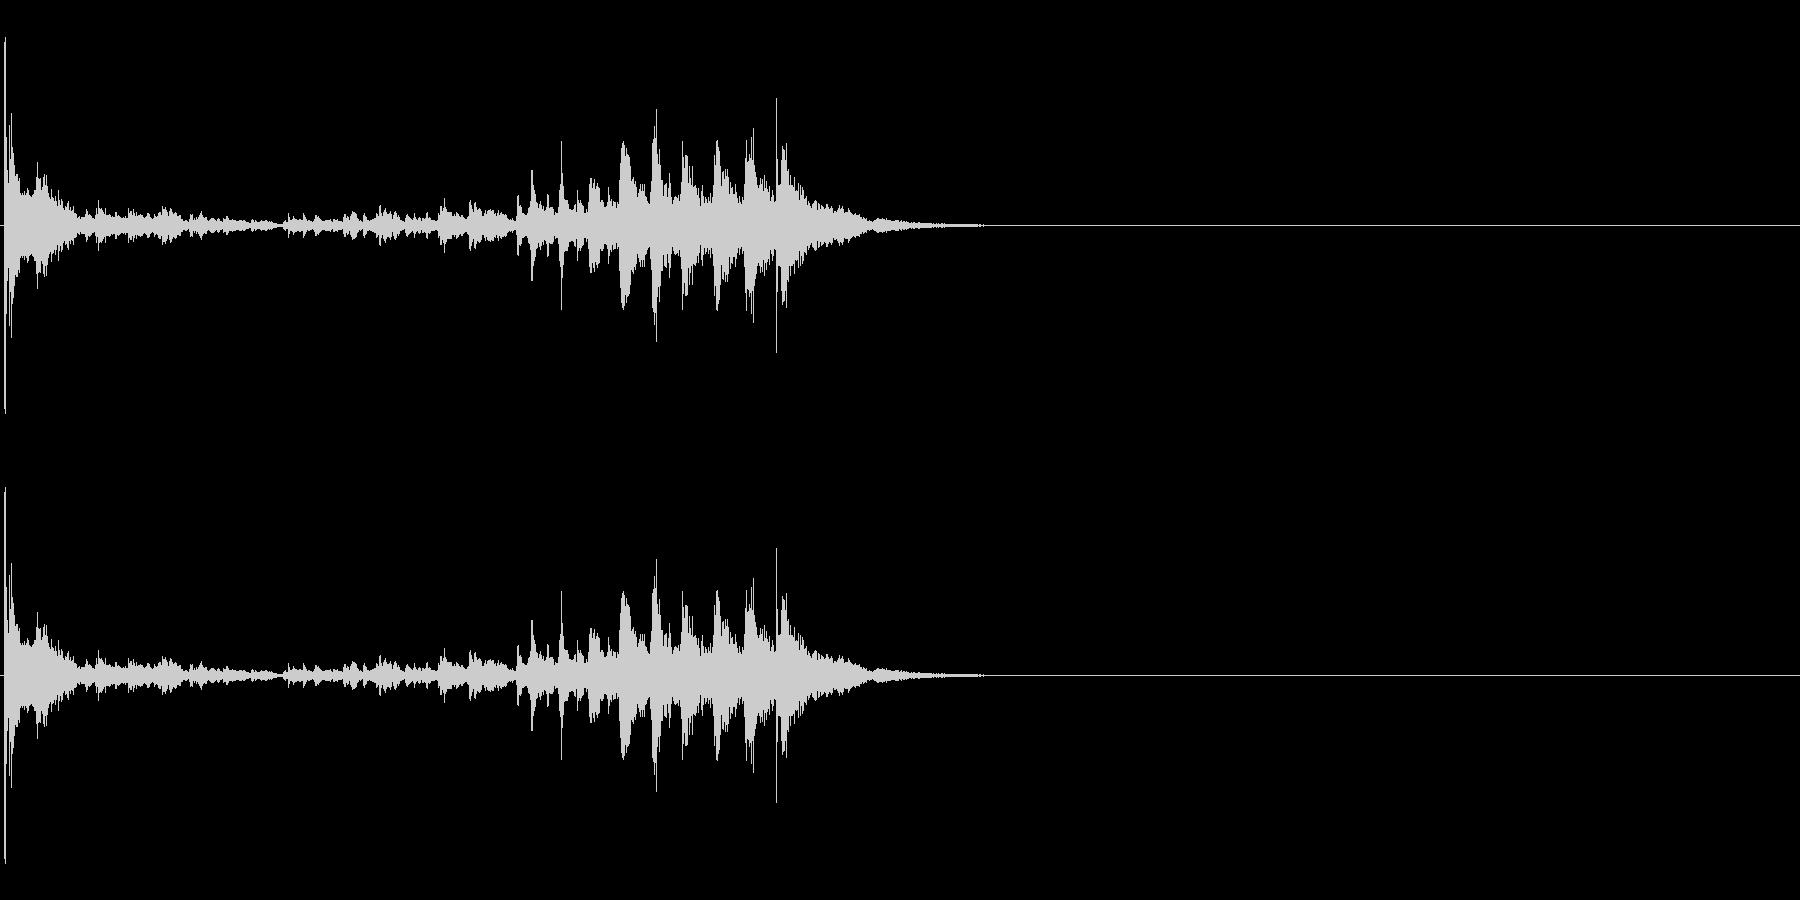 生演奏 琵琶 武士 和風 古典風#17の未再生の波形